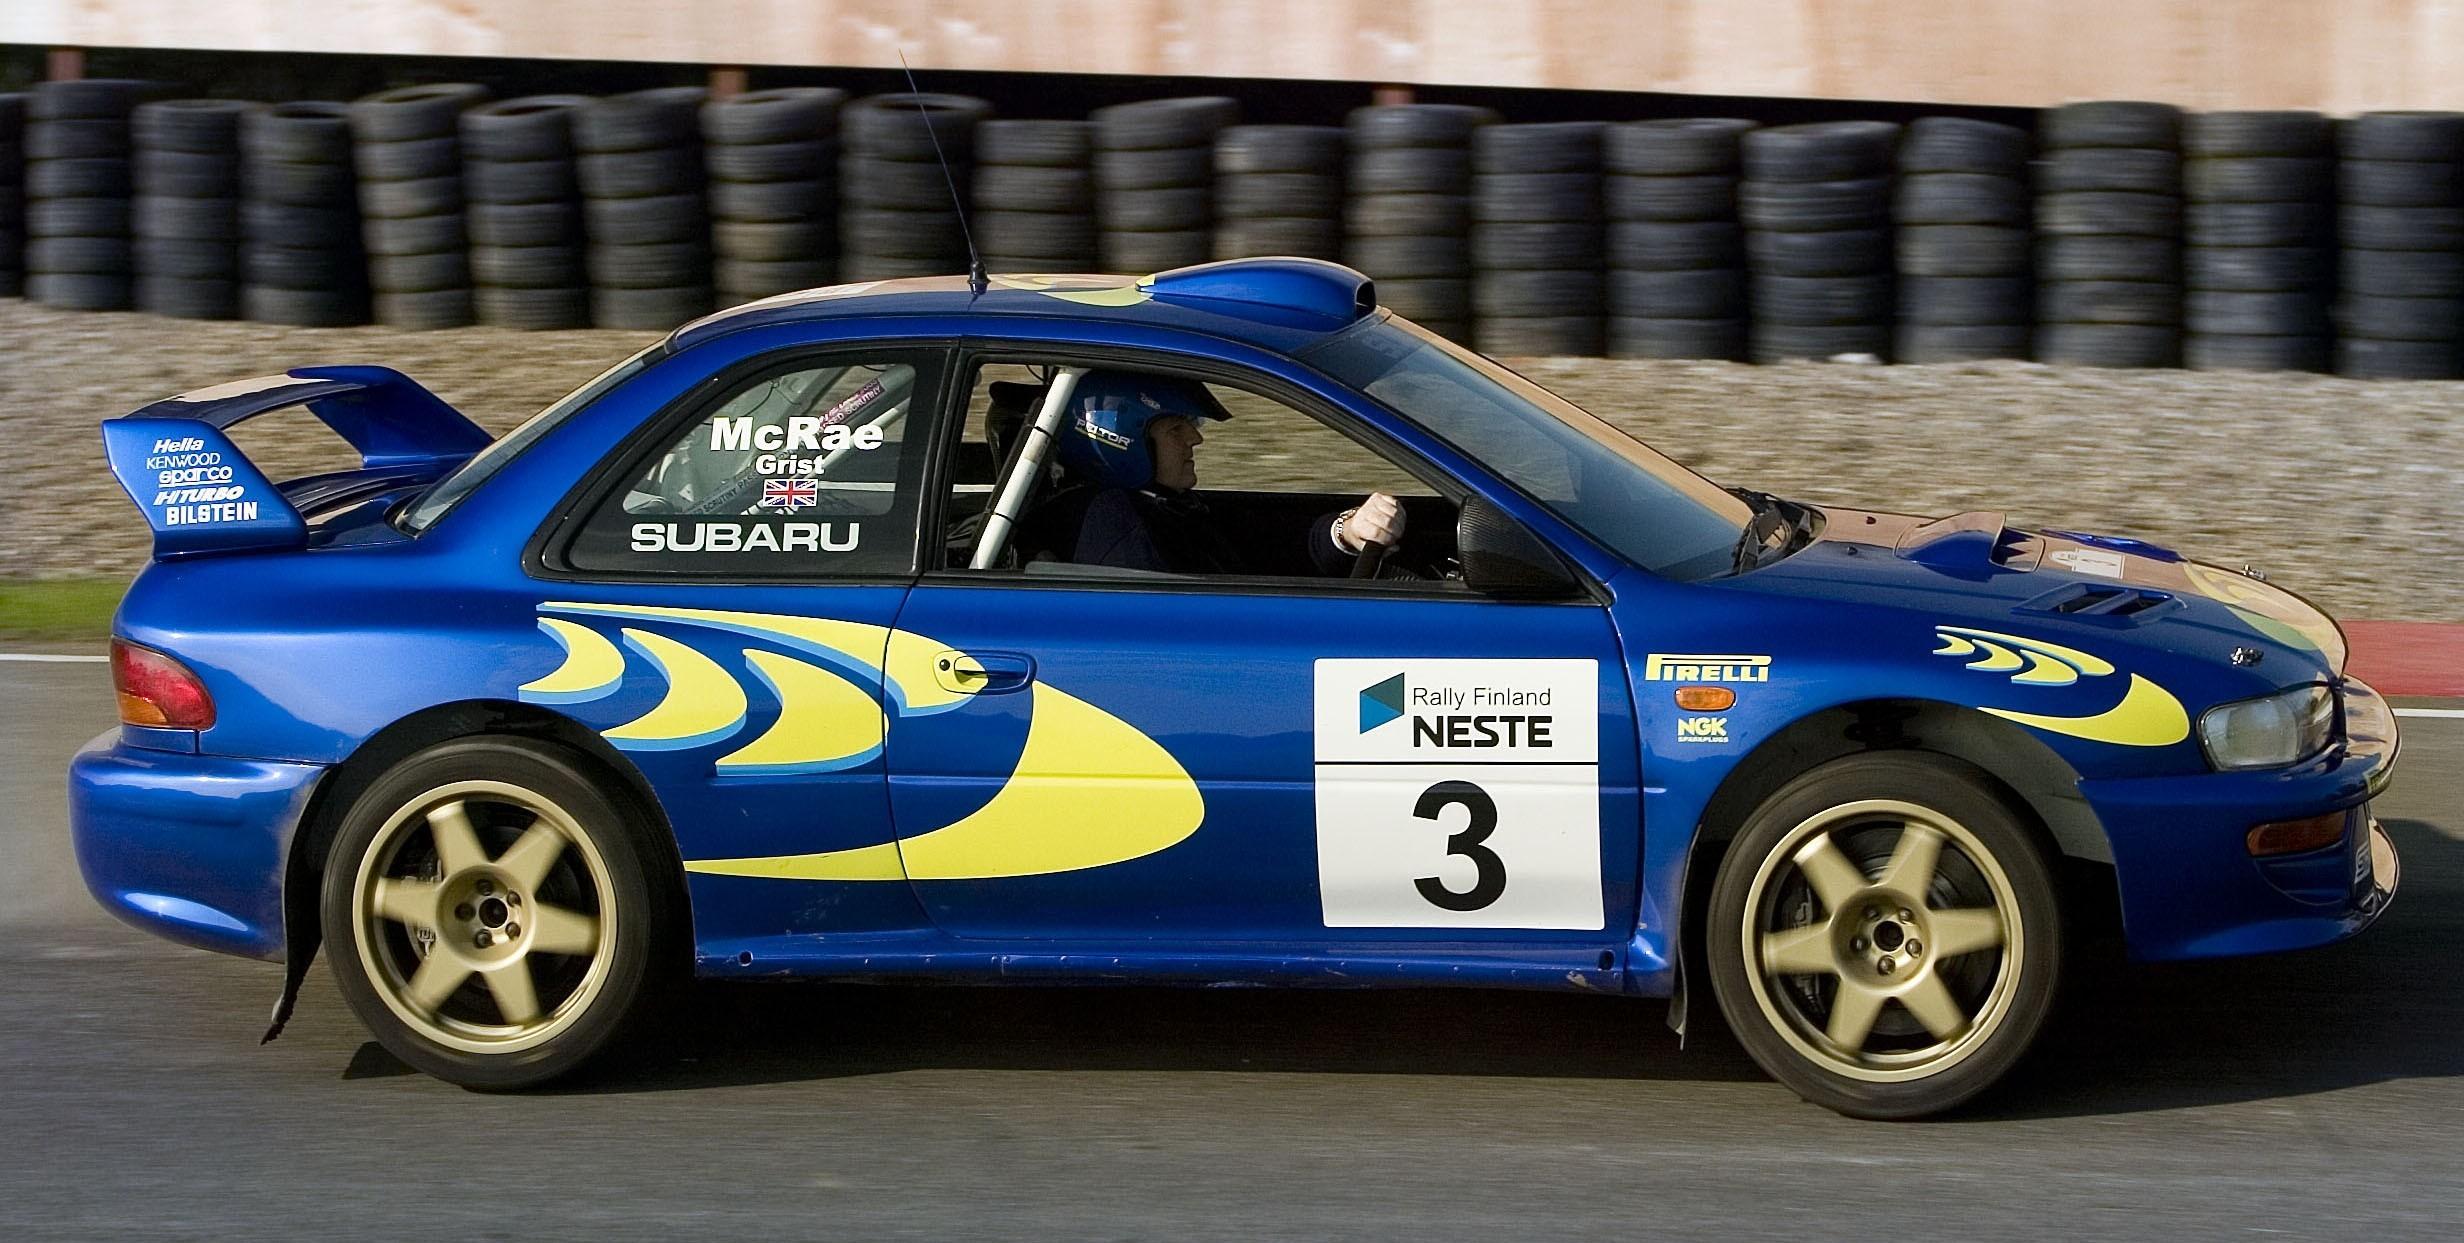 Subaru Impreza Wrc on 1997 Dodge Concept